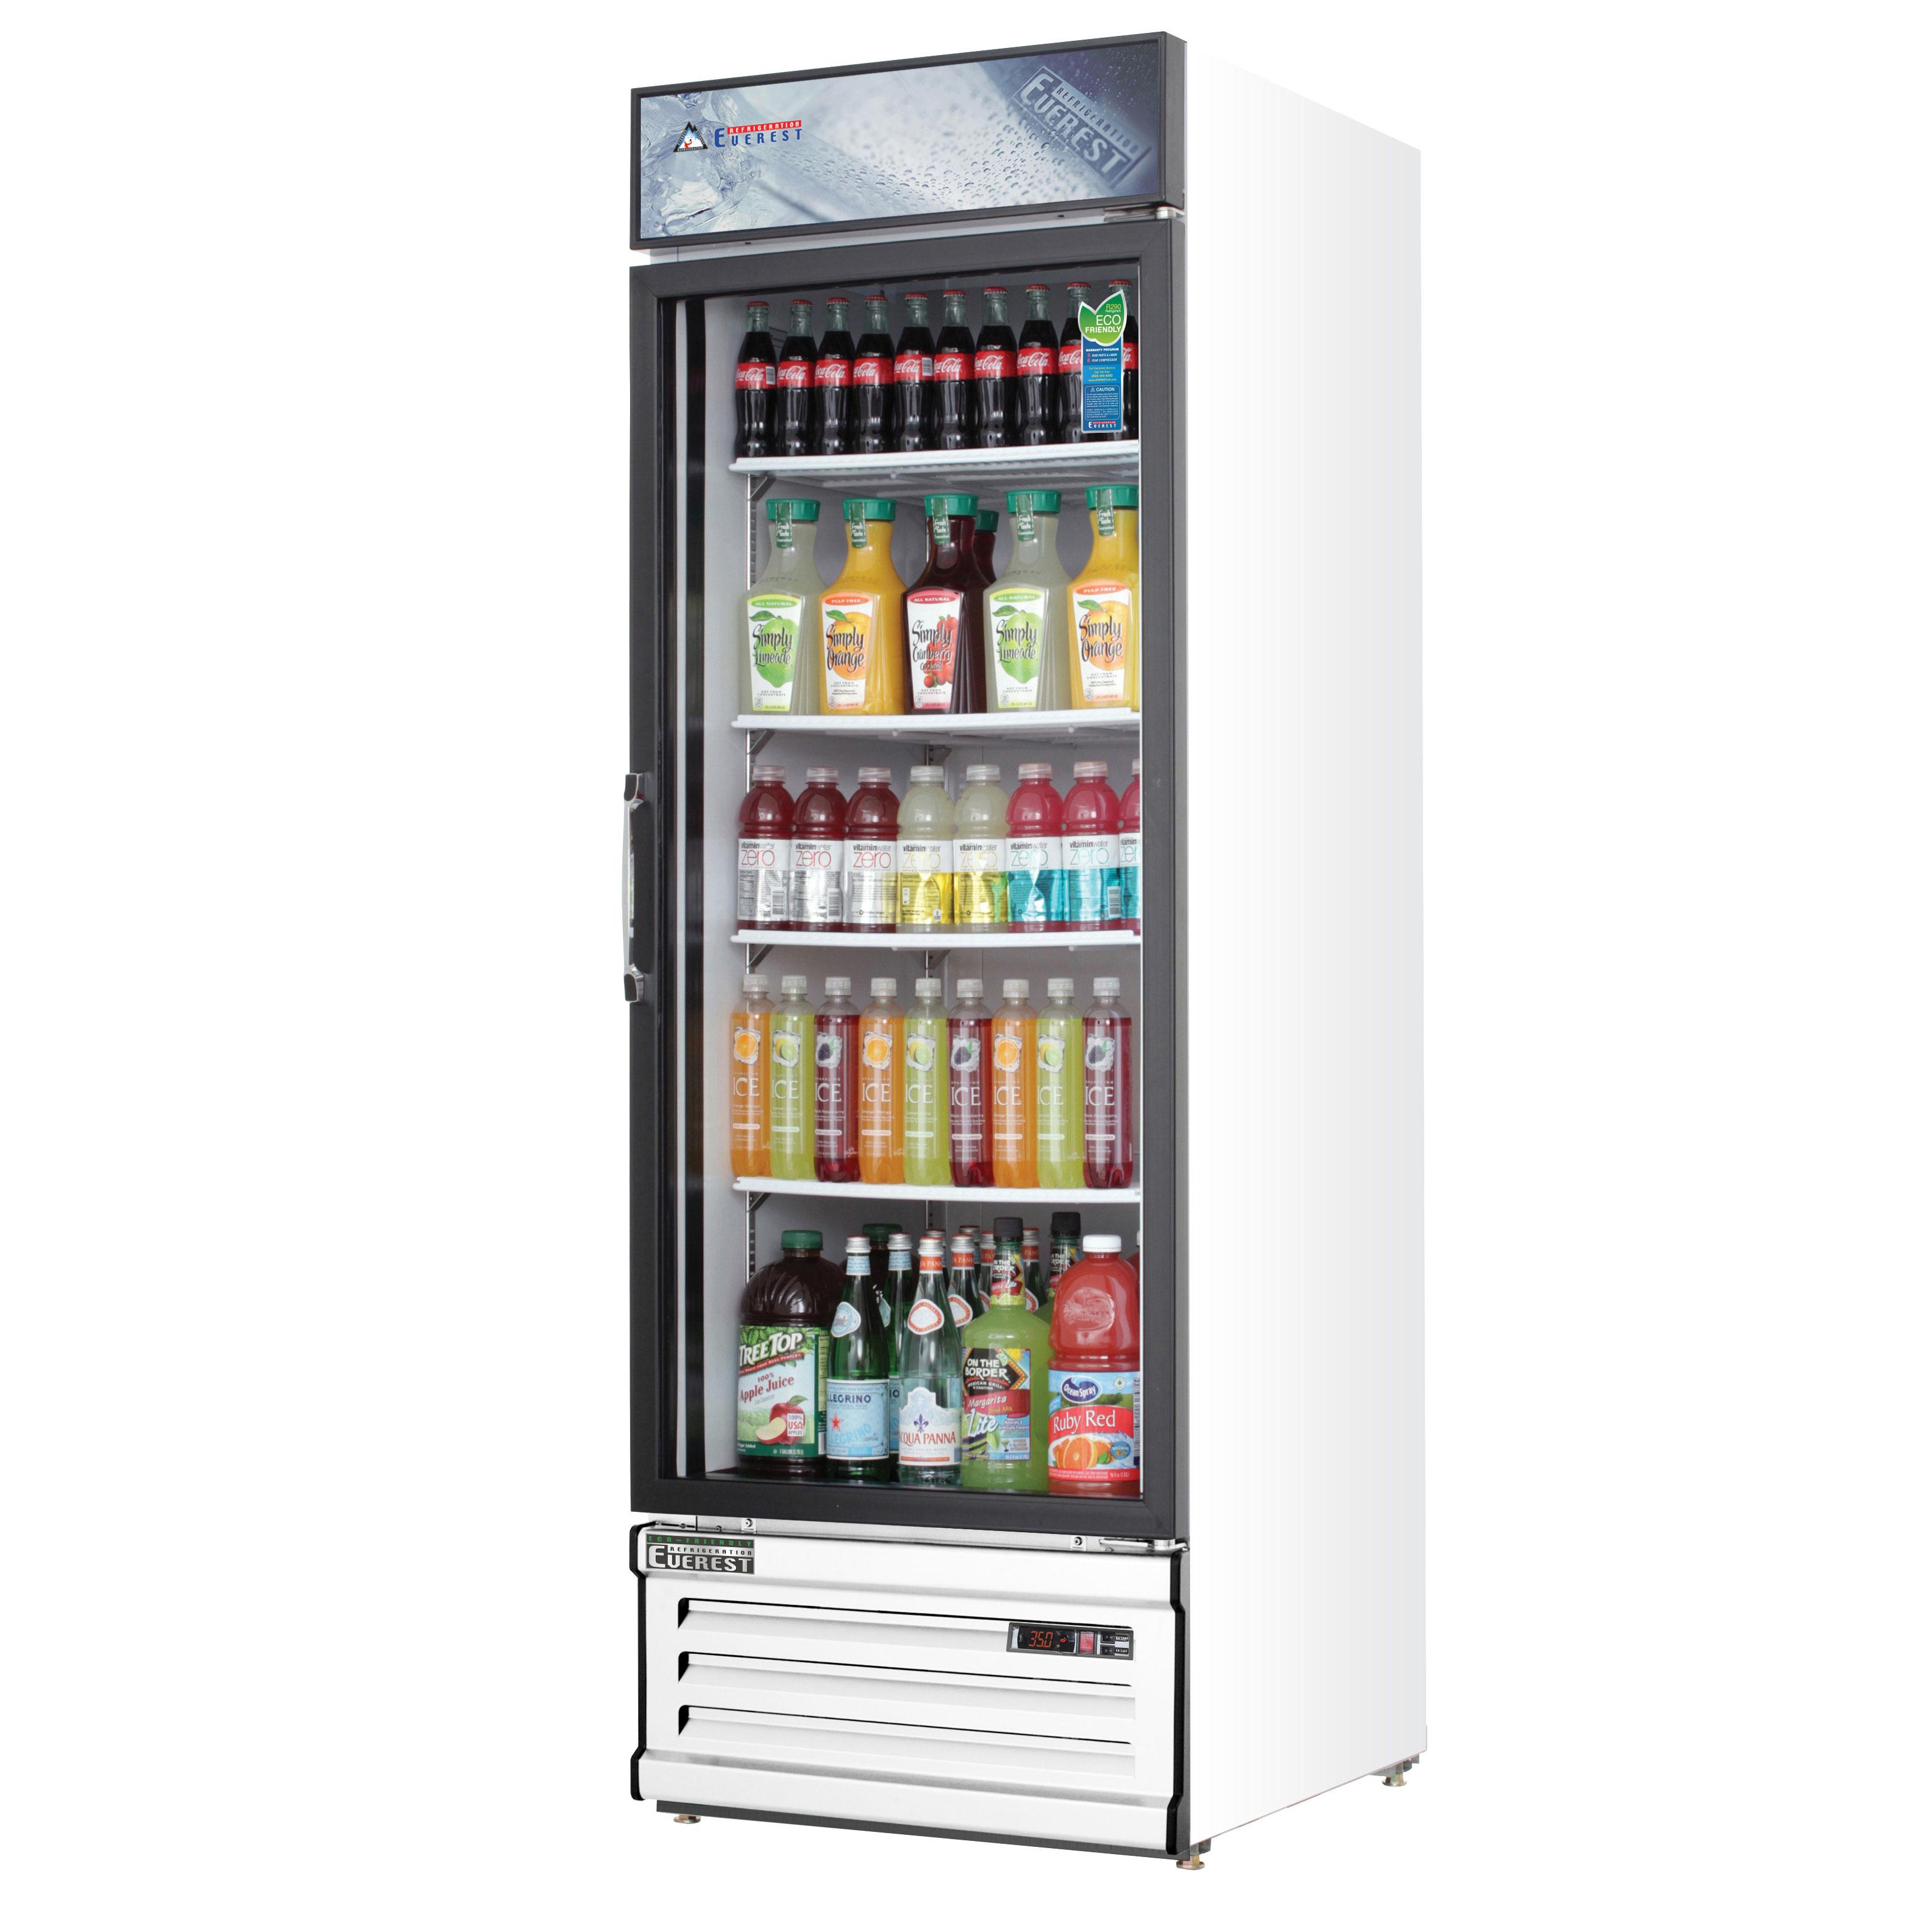 Everest Refrigeration EMGR20 refrigerator, merchandiser